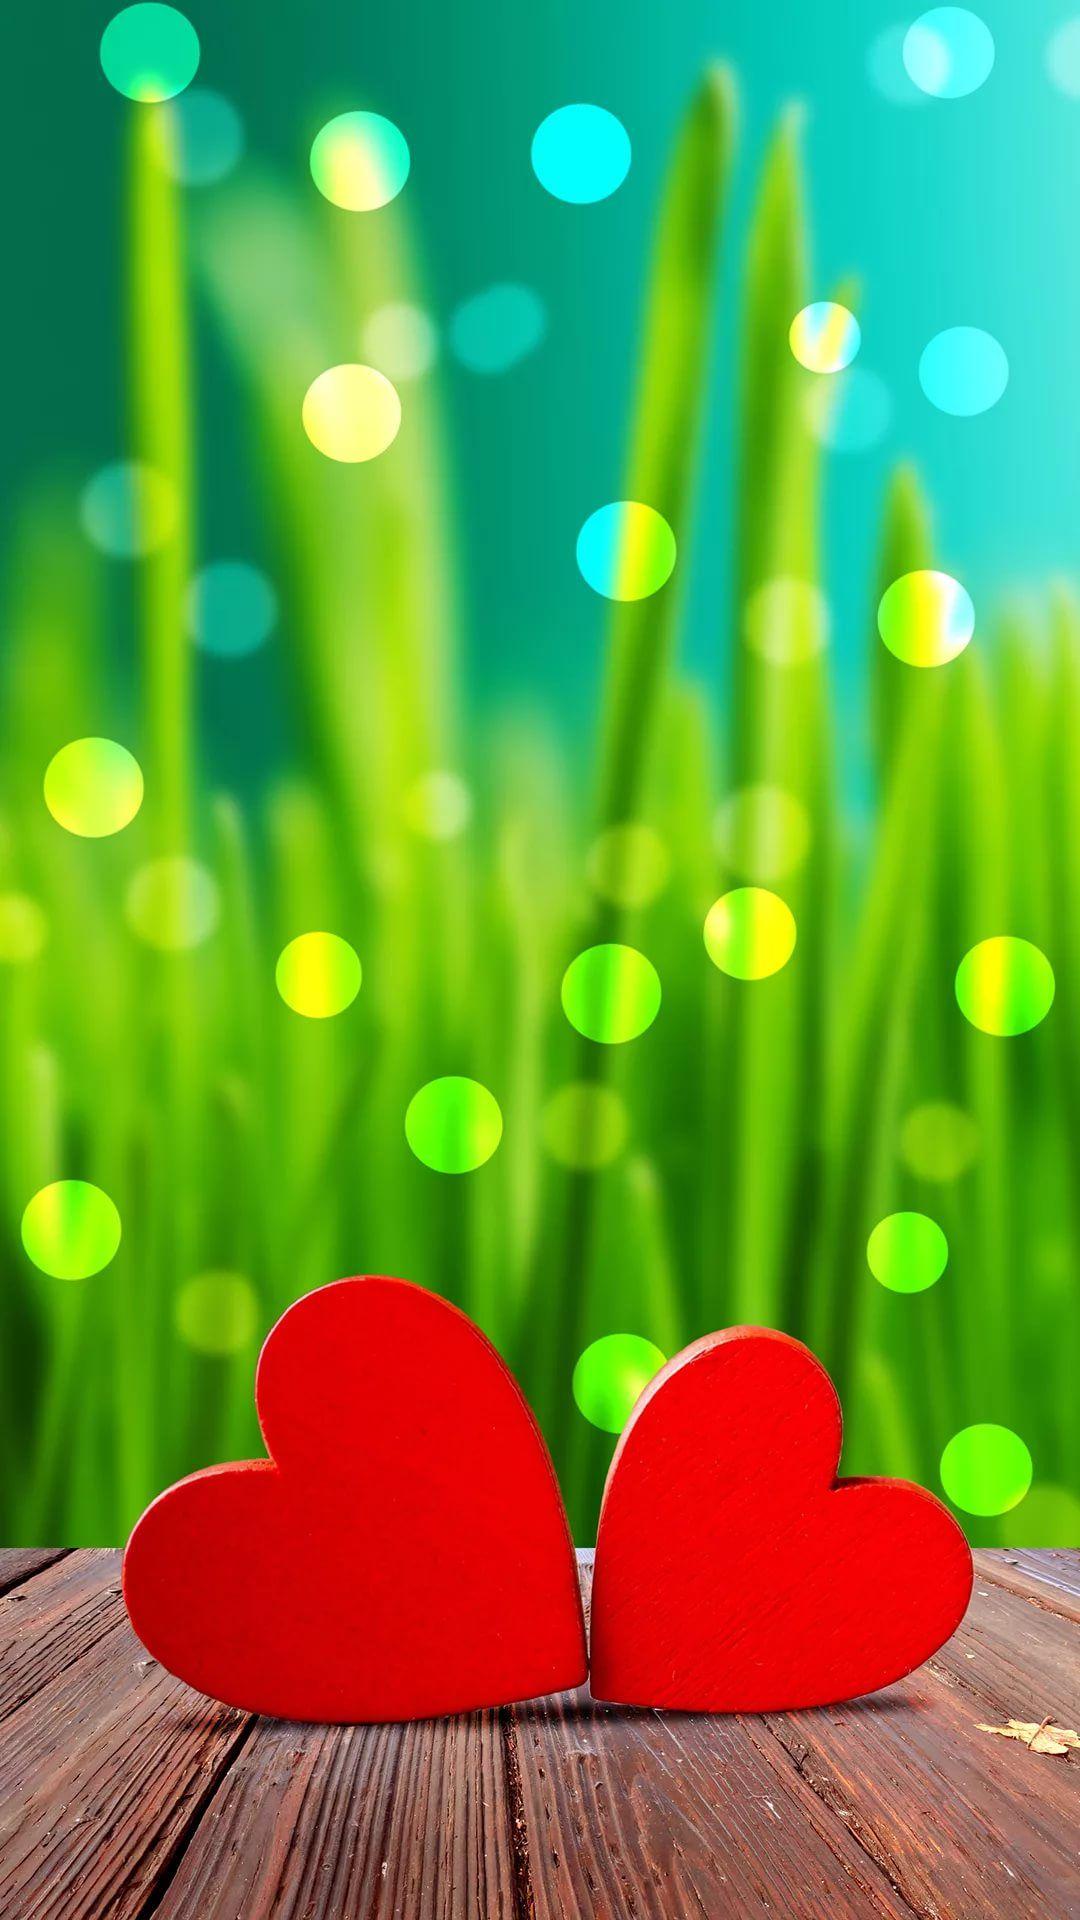 Cute Love samsung wallpaper